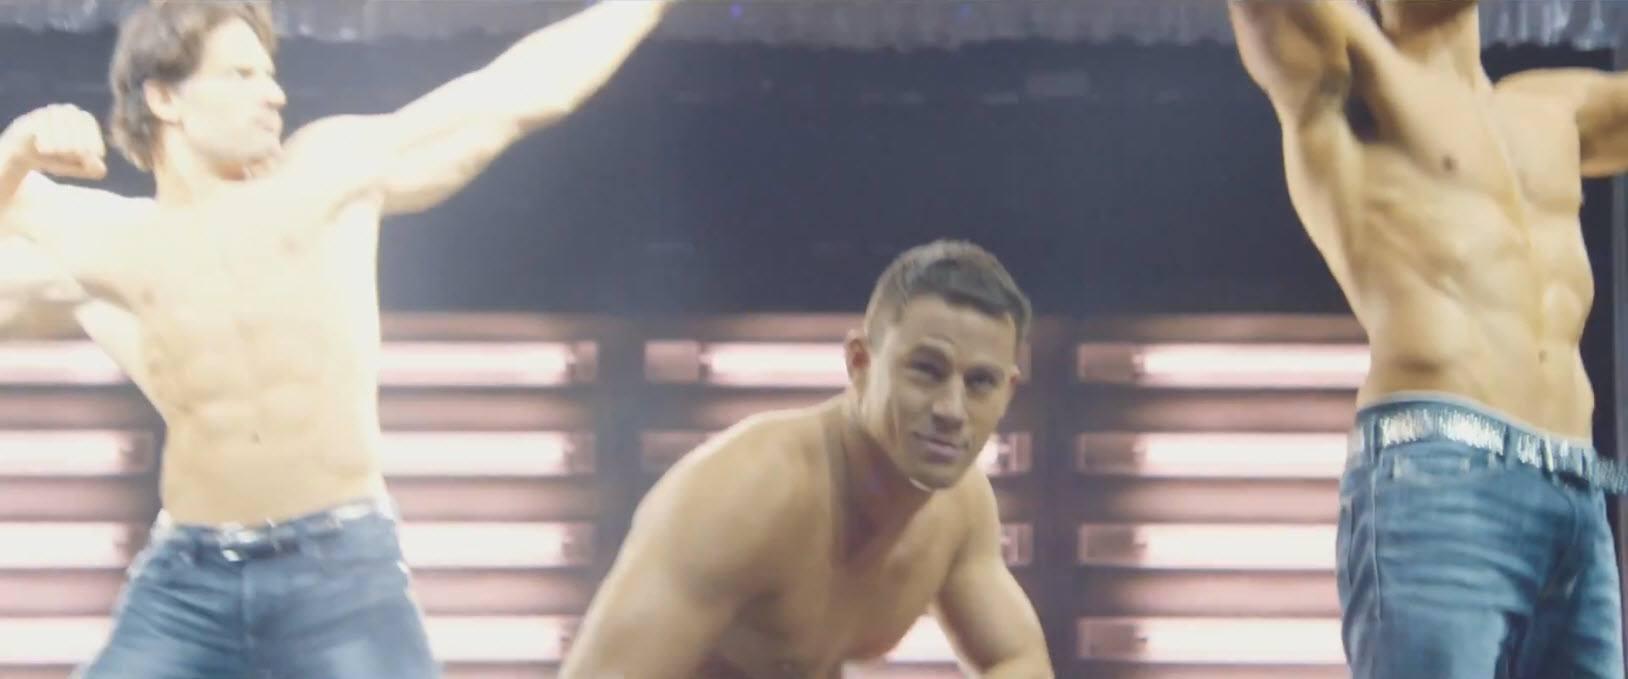 joe manganiello with channing tatum stripping down for magic mike xxl 2015